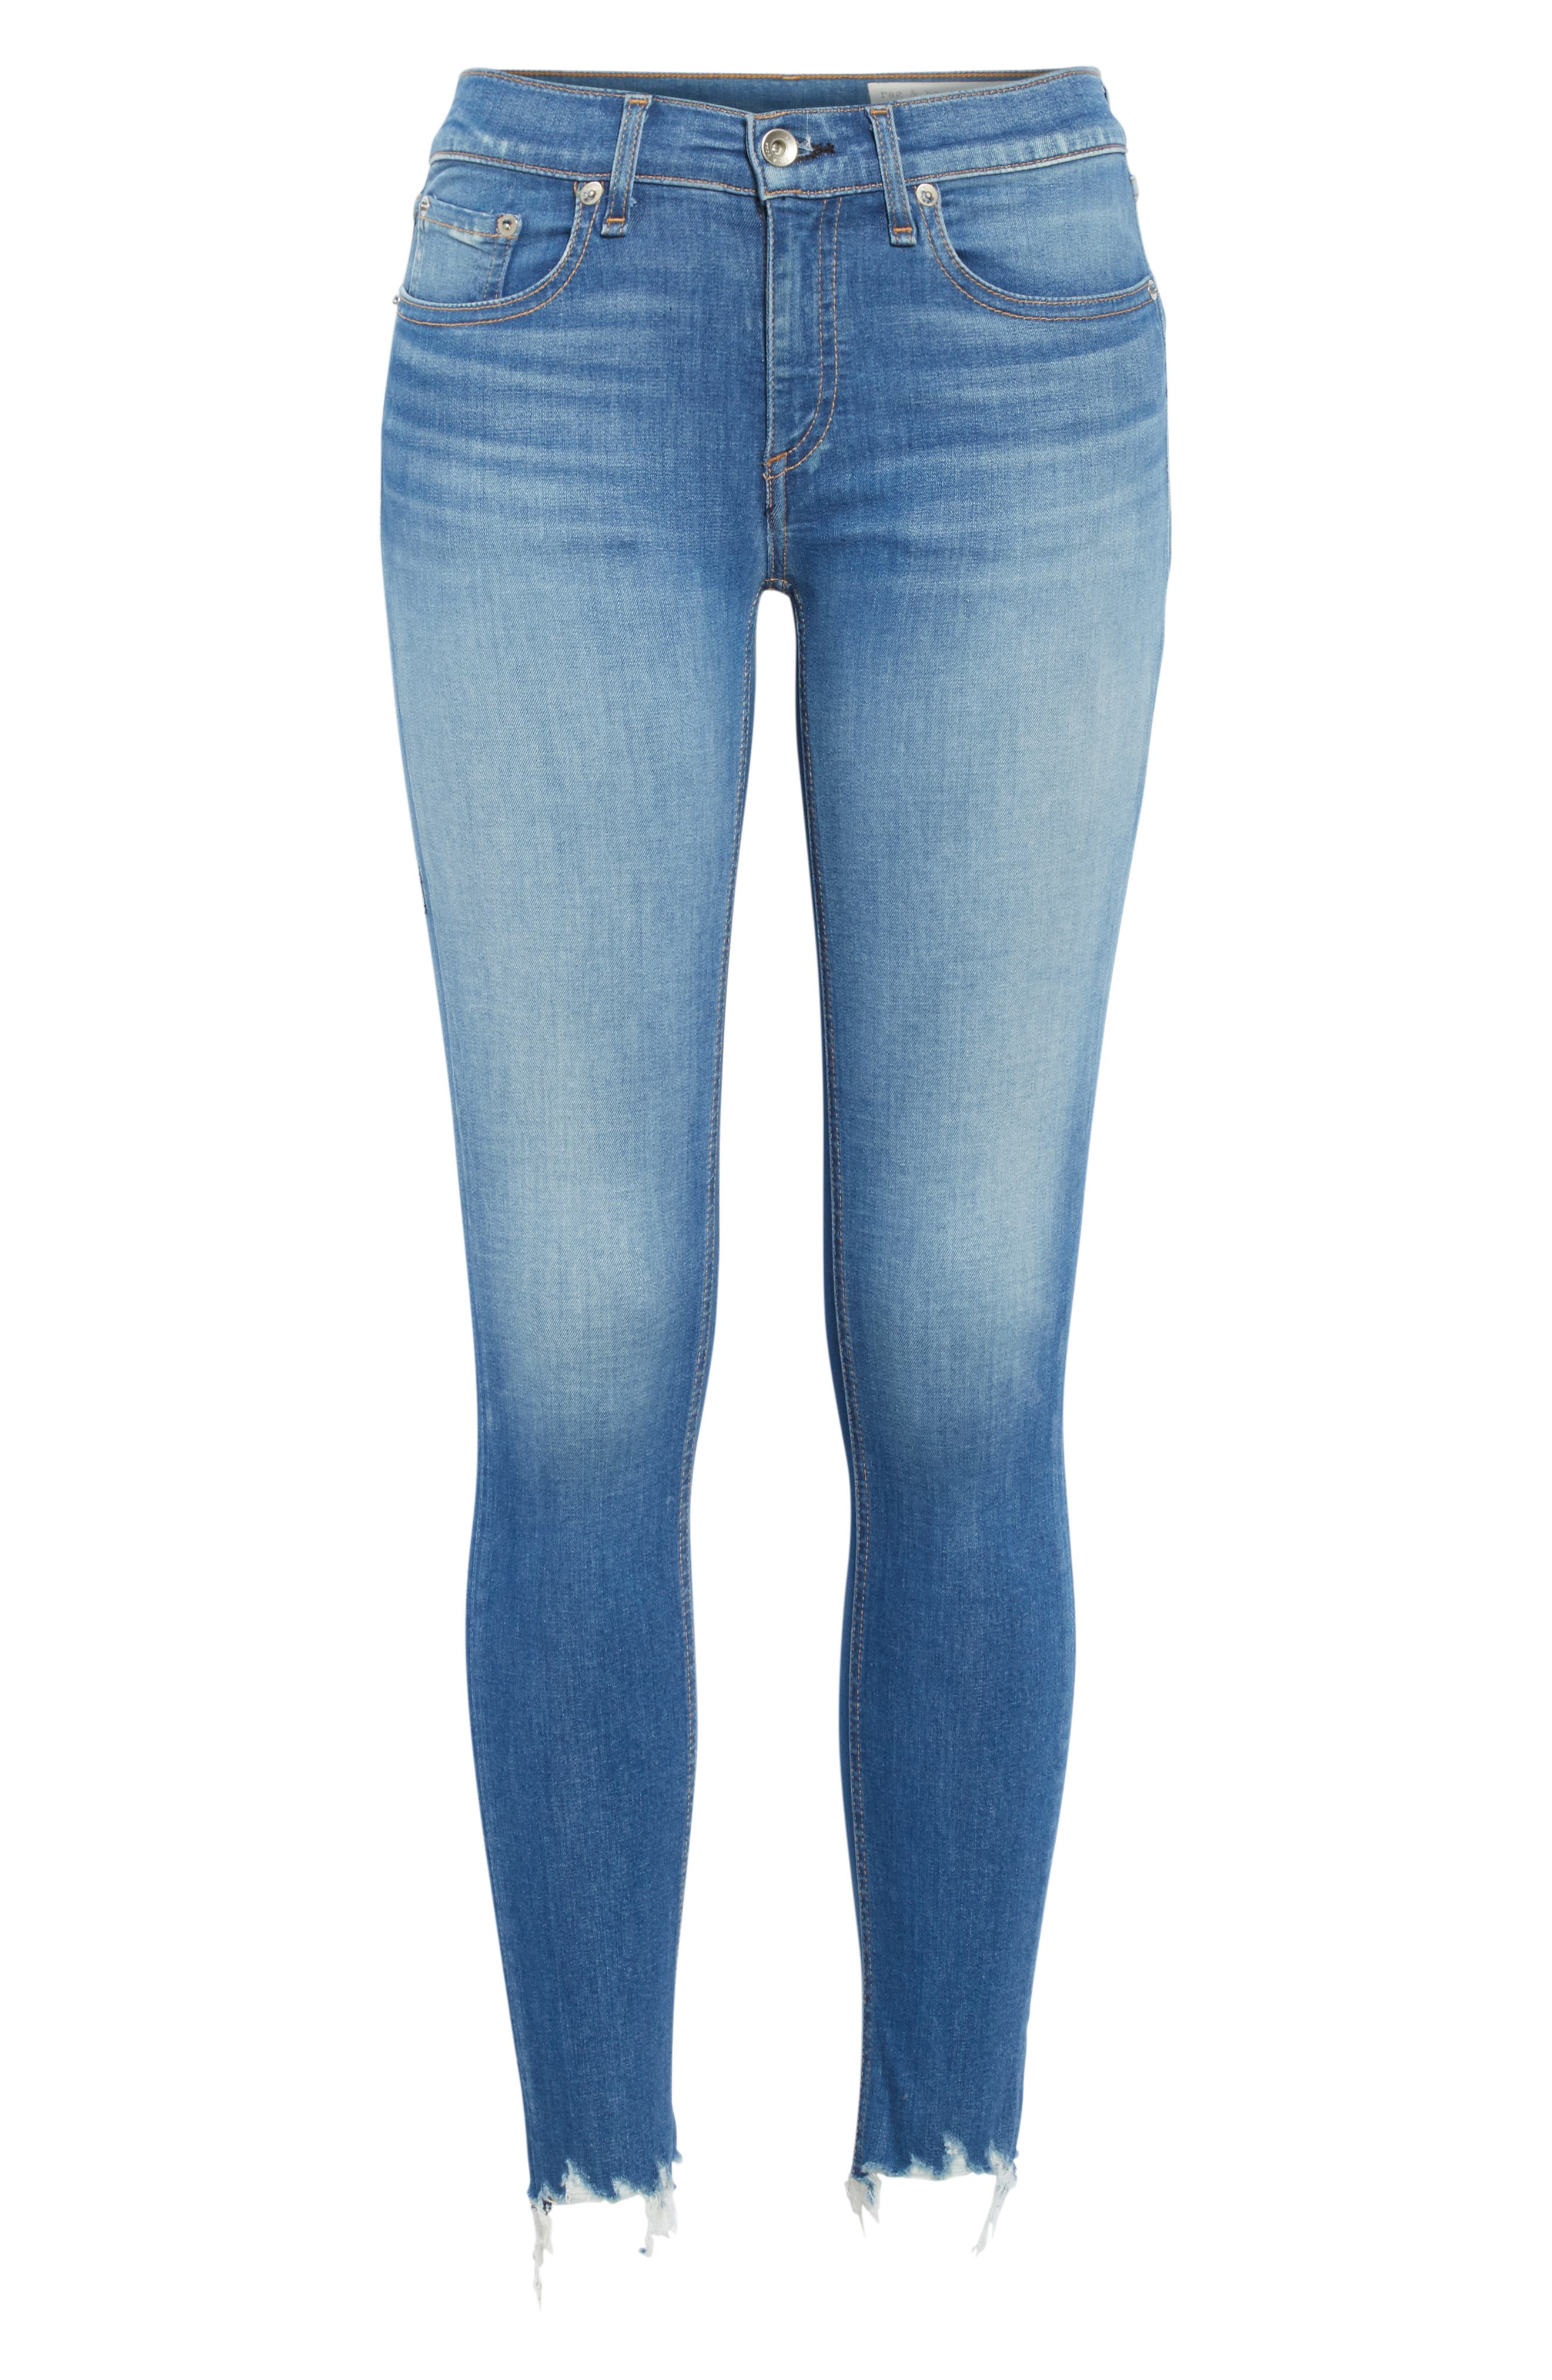 RAG & BONE, Cate High Waist Ankle Skinny Jeans, Alternate thumbnail 7, color, FLINT